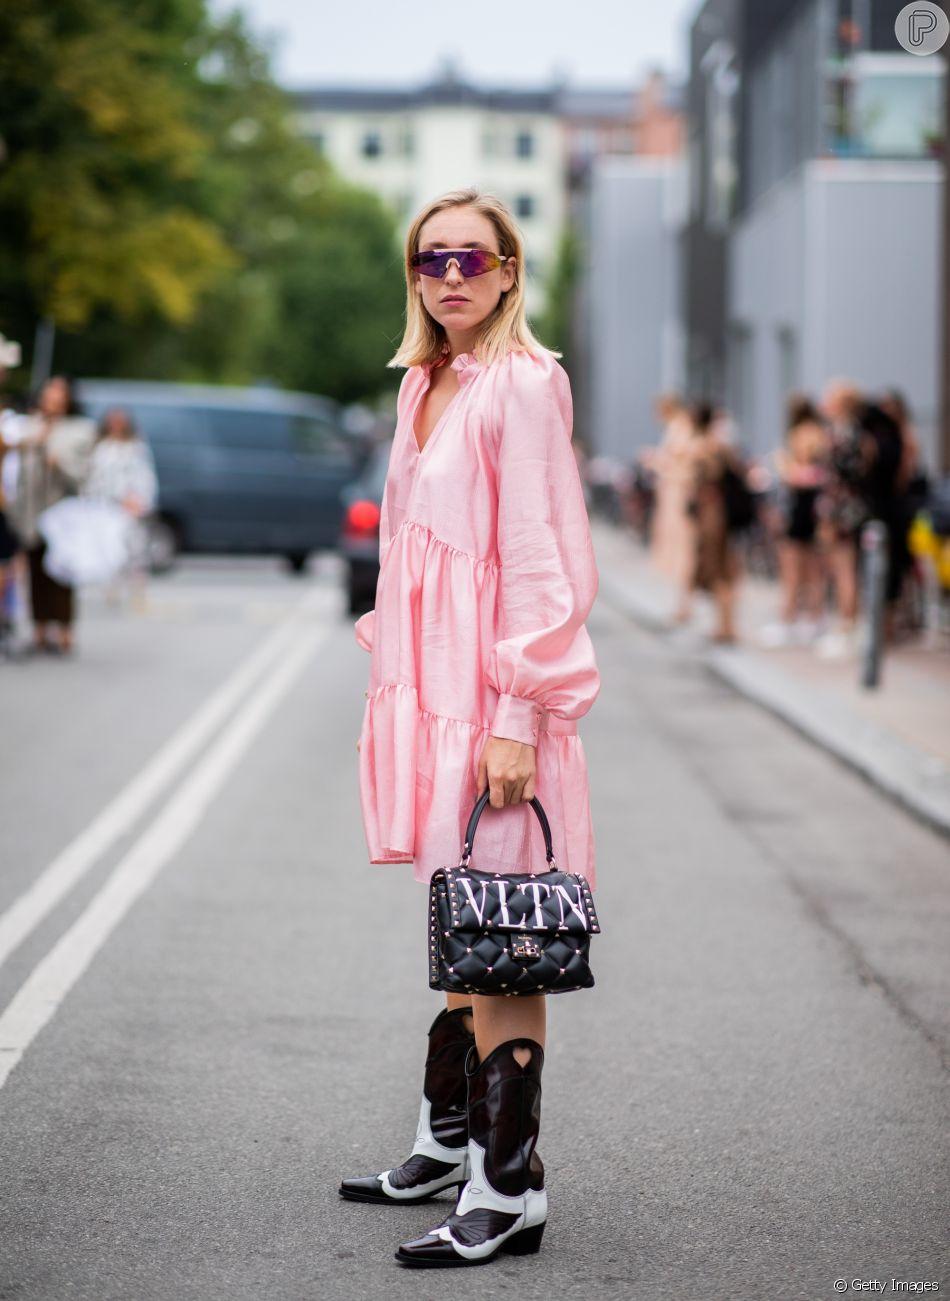 Vestido rosa: com bota western e bolsa statement Valentino